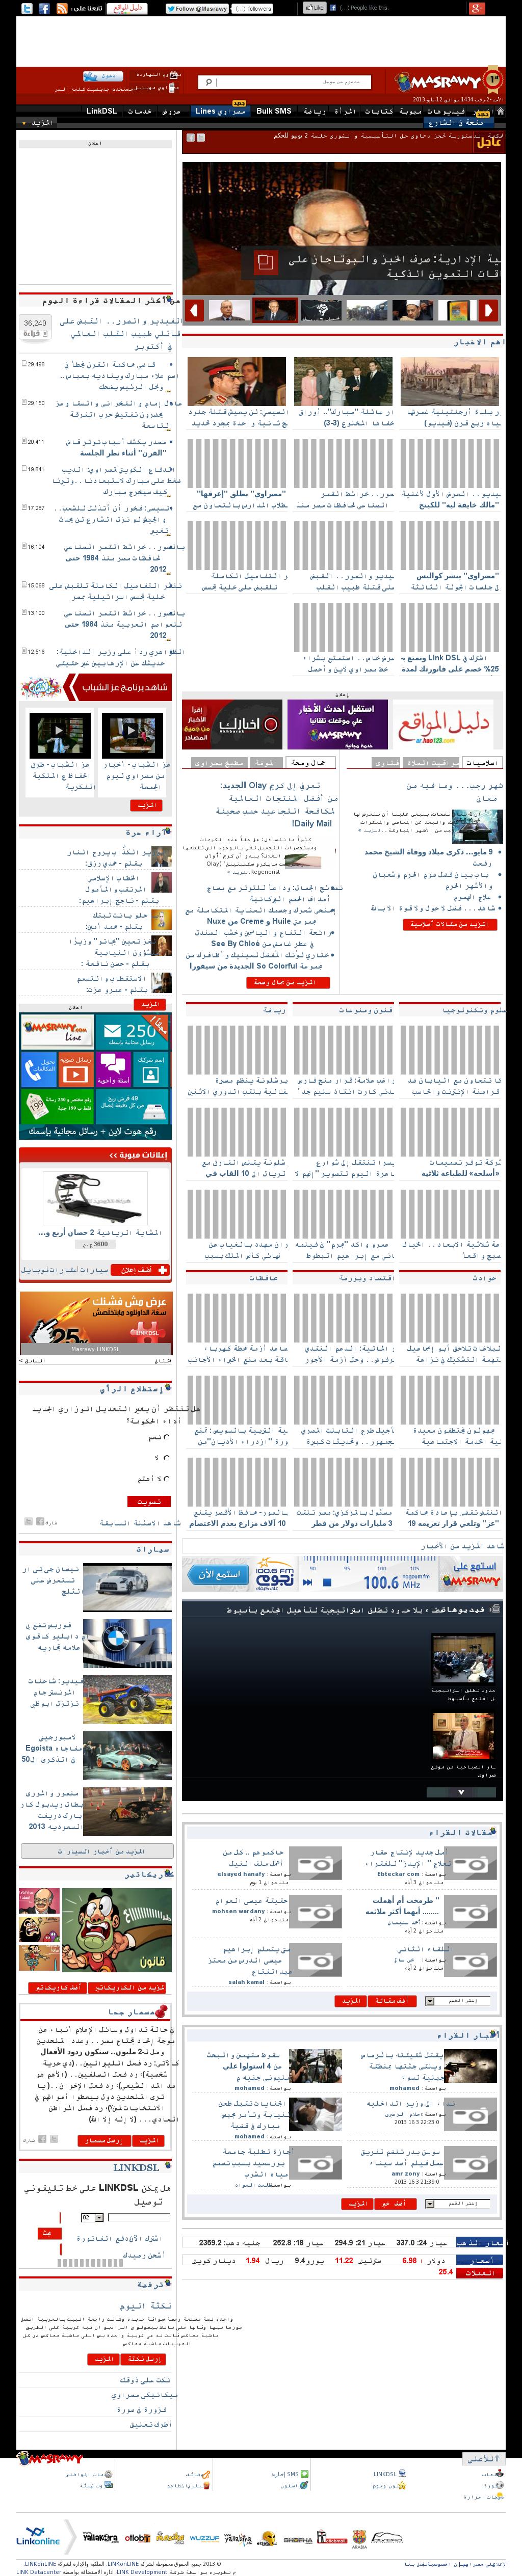 Masrawy at Sunday May 12, 2013, 12:13 p.m. UTC